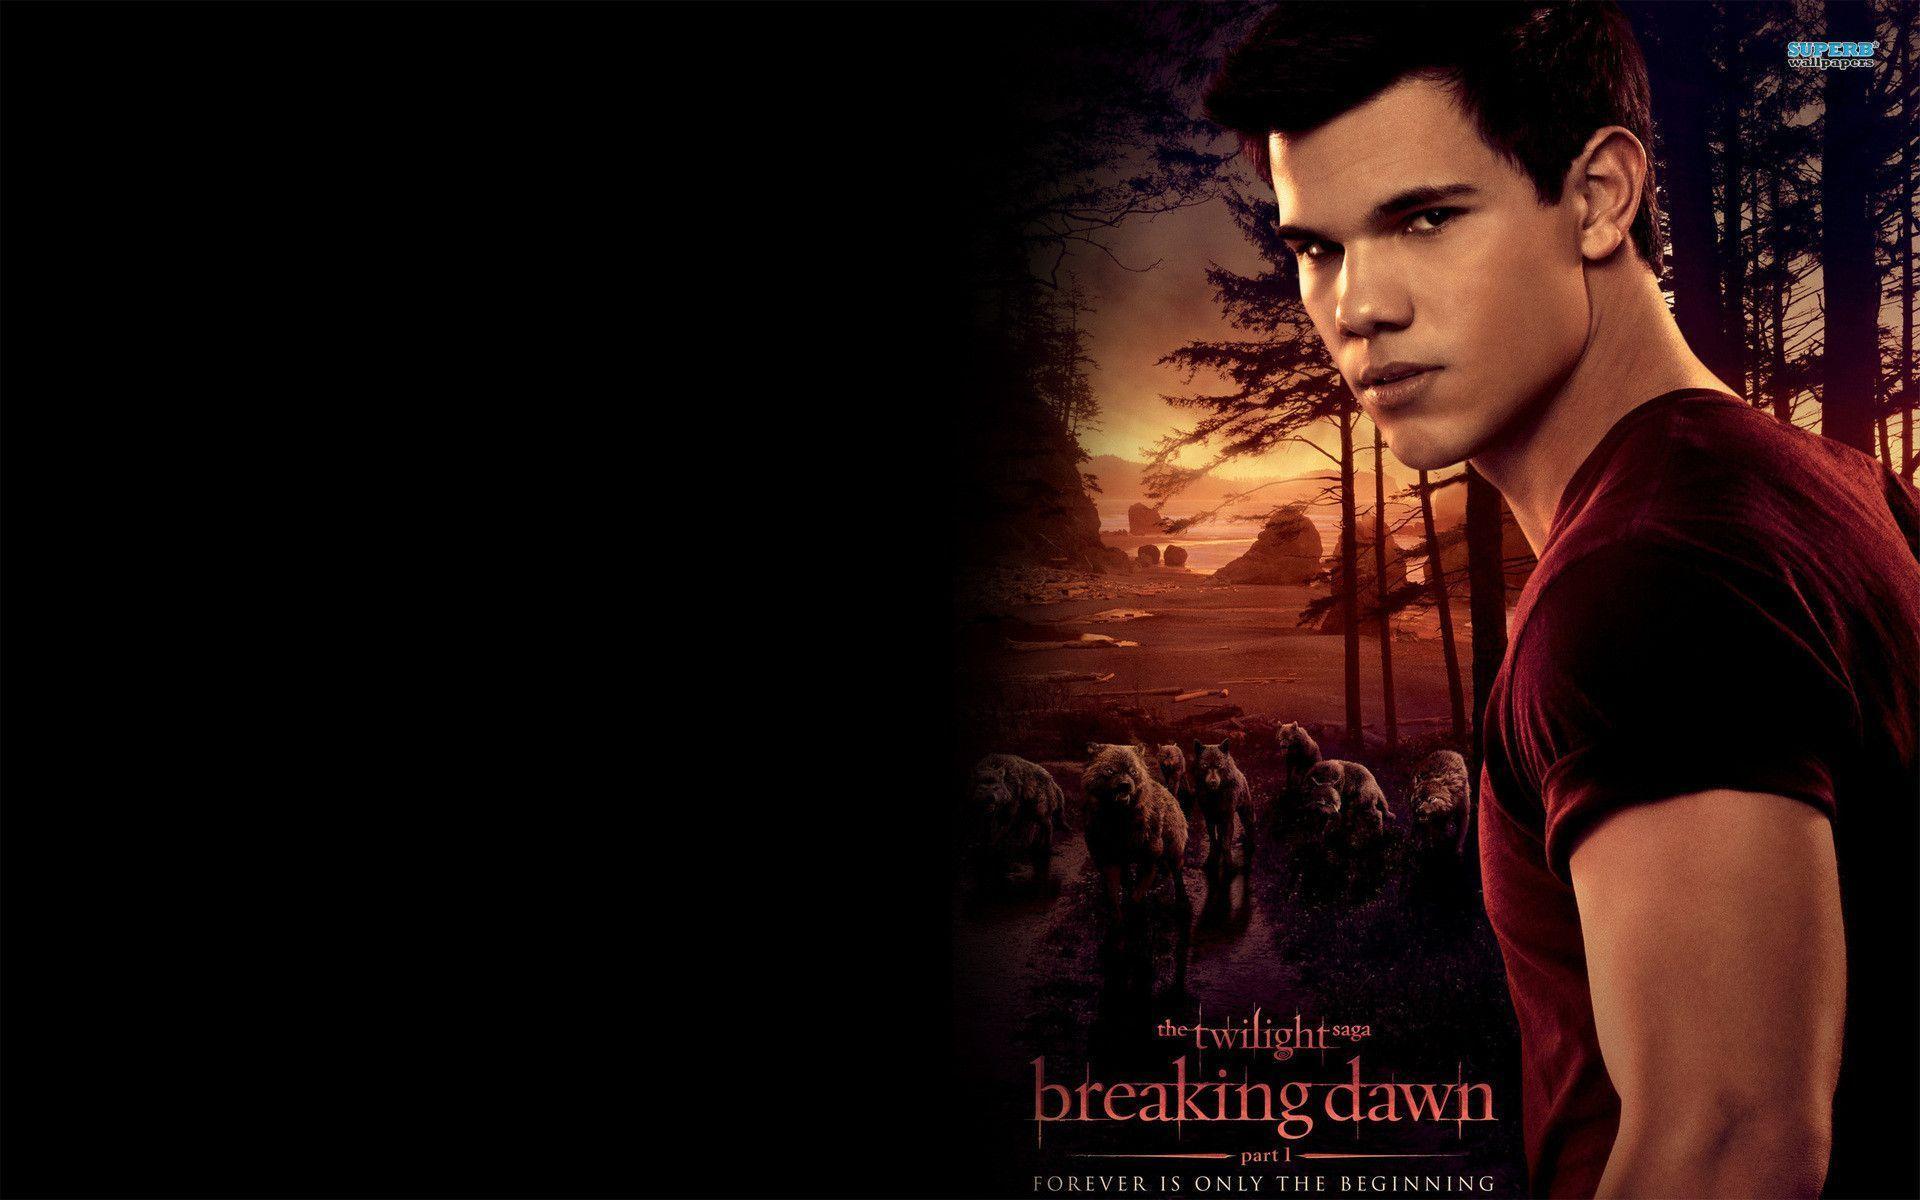 Twilight Breaking Dawn Part 2 Wallpaper Hd Twilight Jacob Black Wallpapers Wallpaper Cave